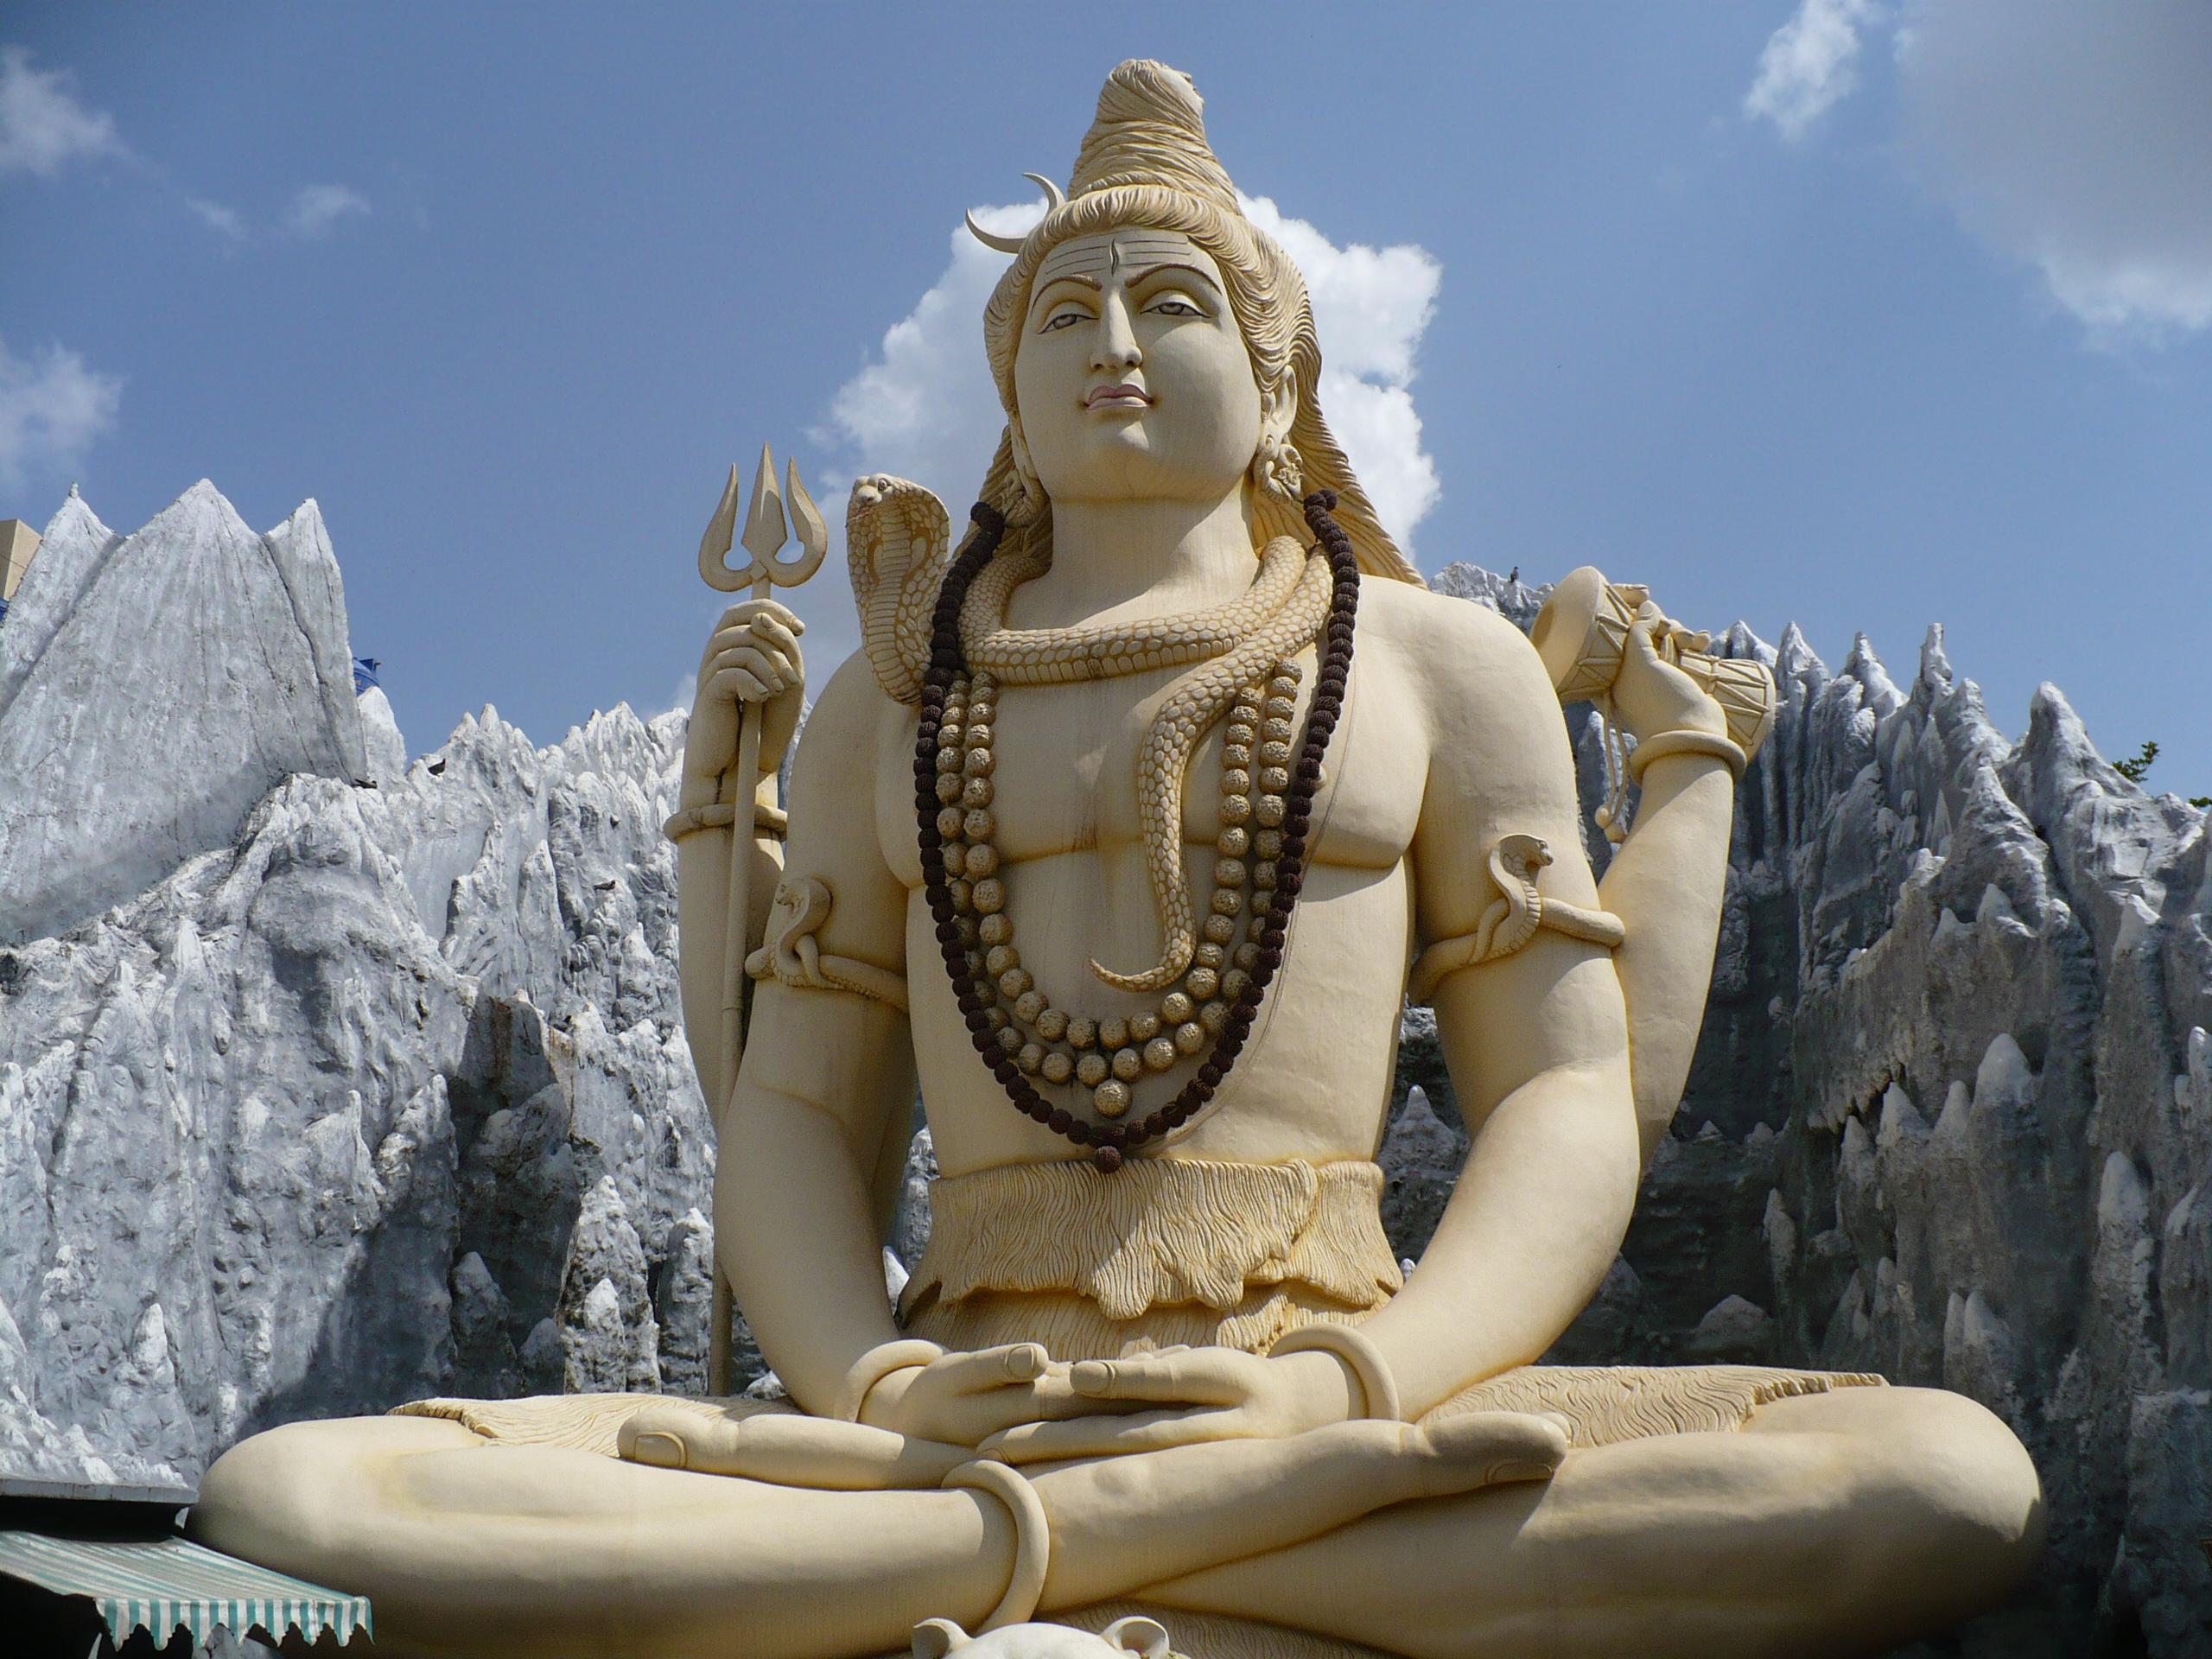 https://i1.wp.com/upload.wikimedia.org/wikipedia/commons/5/52/Bangalore_Shiva.jpg